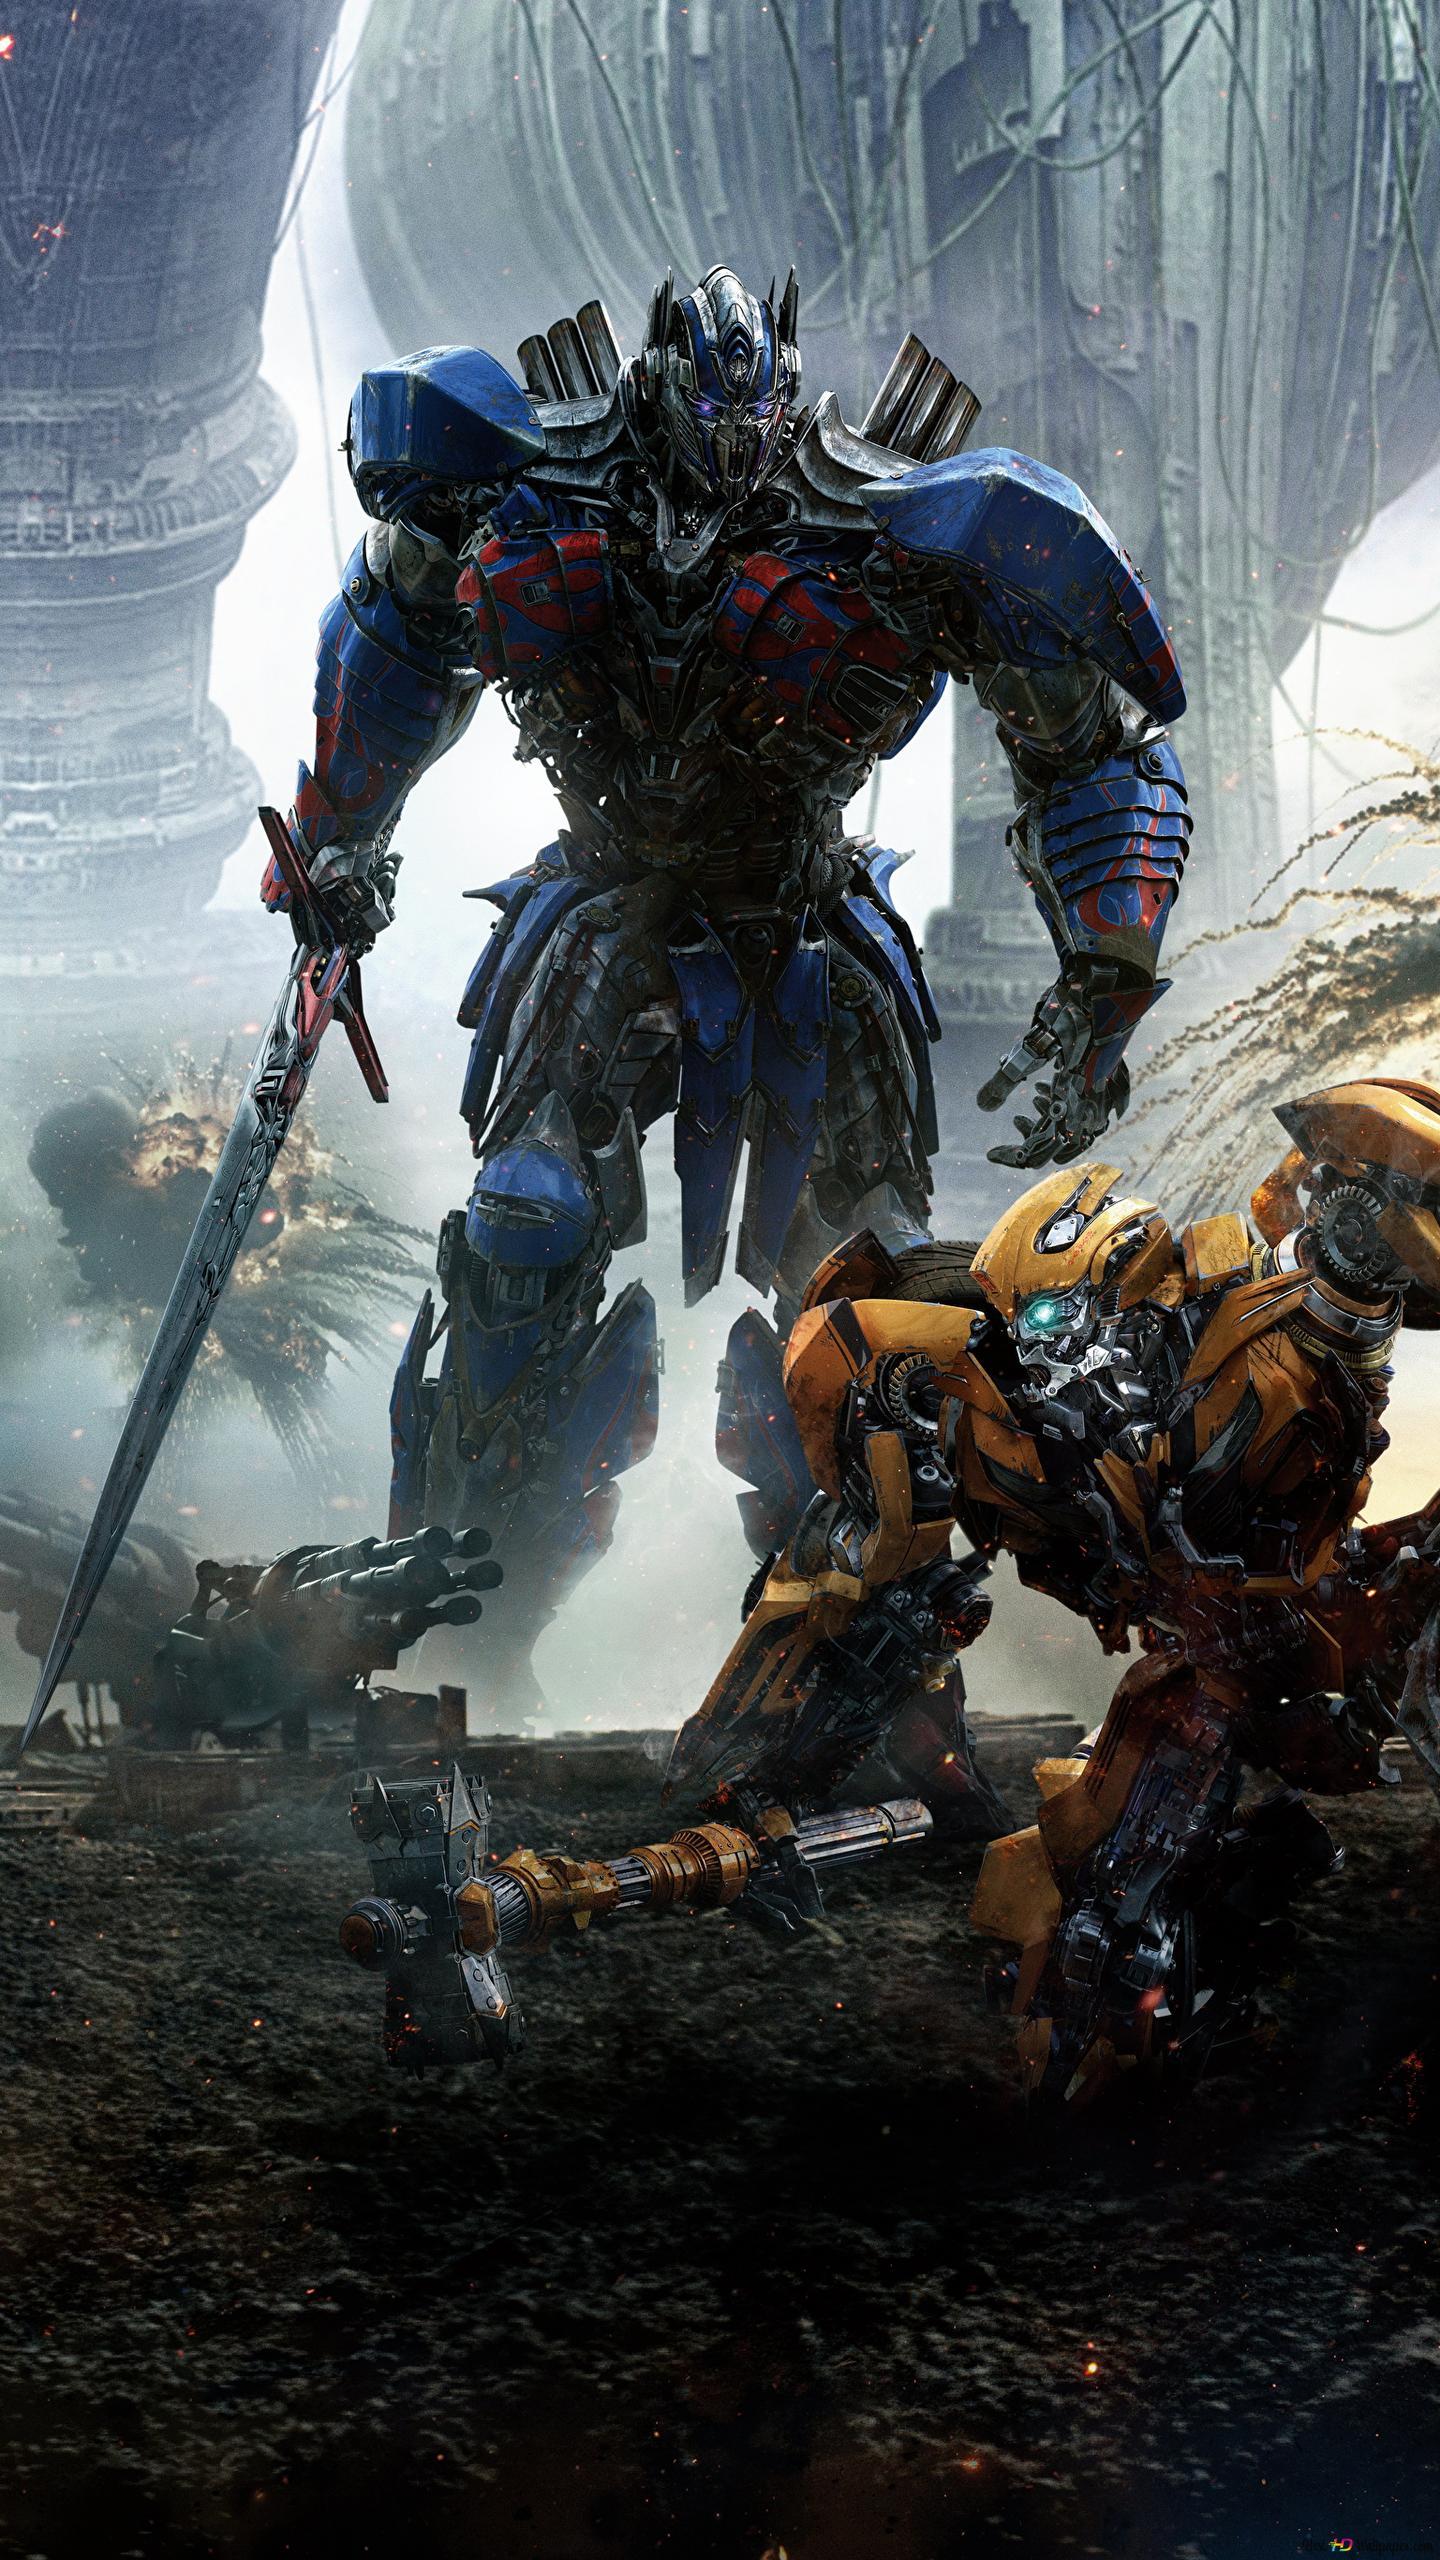 Transformers The Last Knight Optimus Prime I Bumblebee Hd